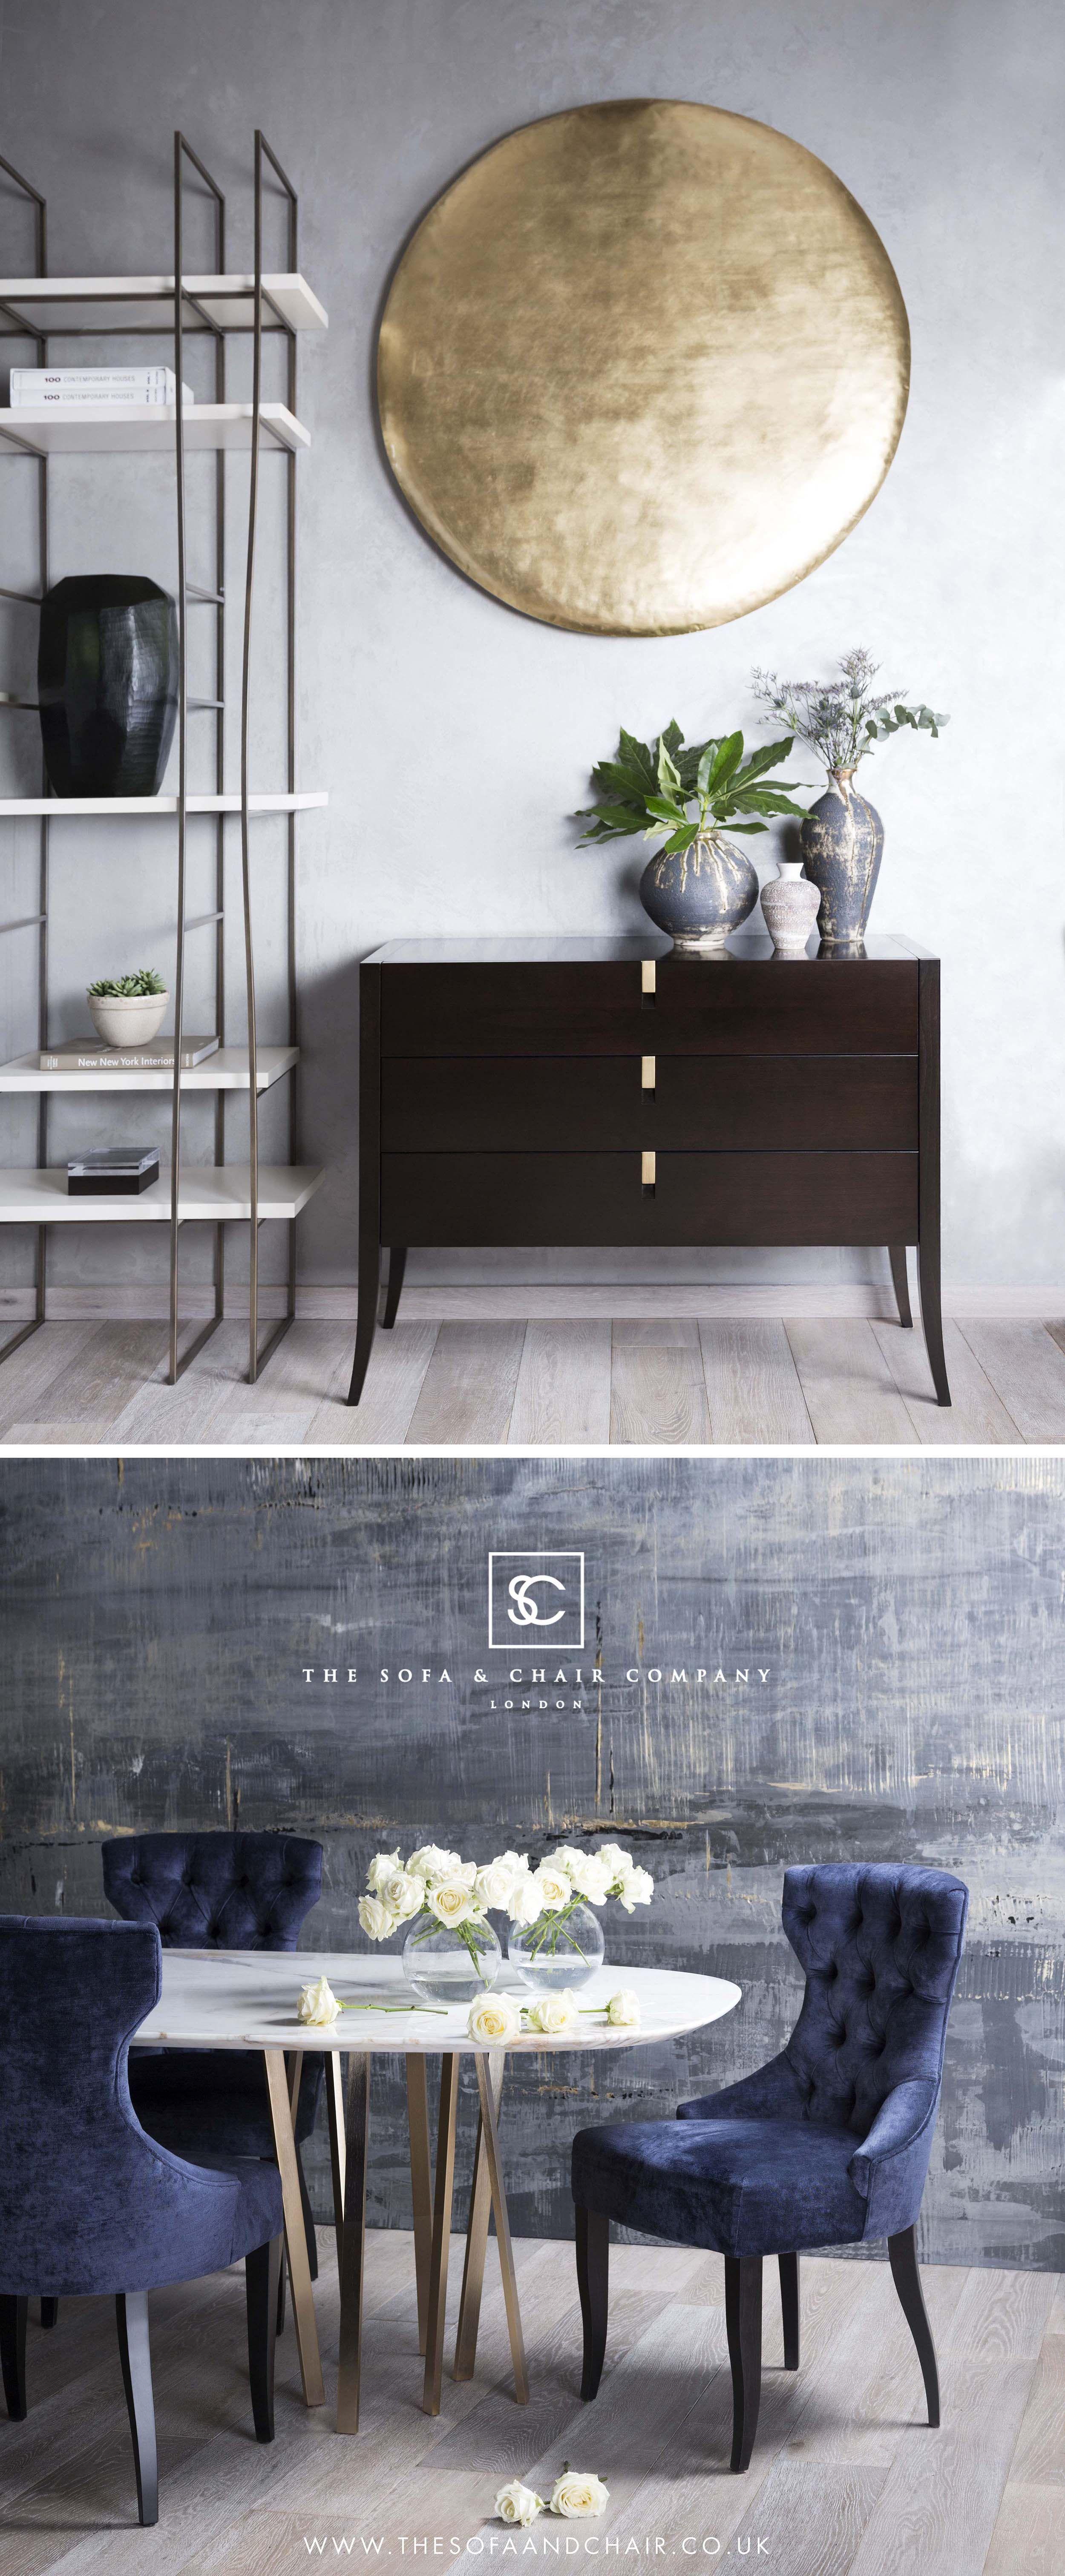 Luxury Furniture Designed Handmade In London The Sofa Chair Company Luxury Furniture Furniture Design Furniture